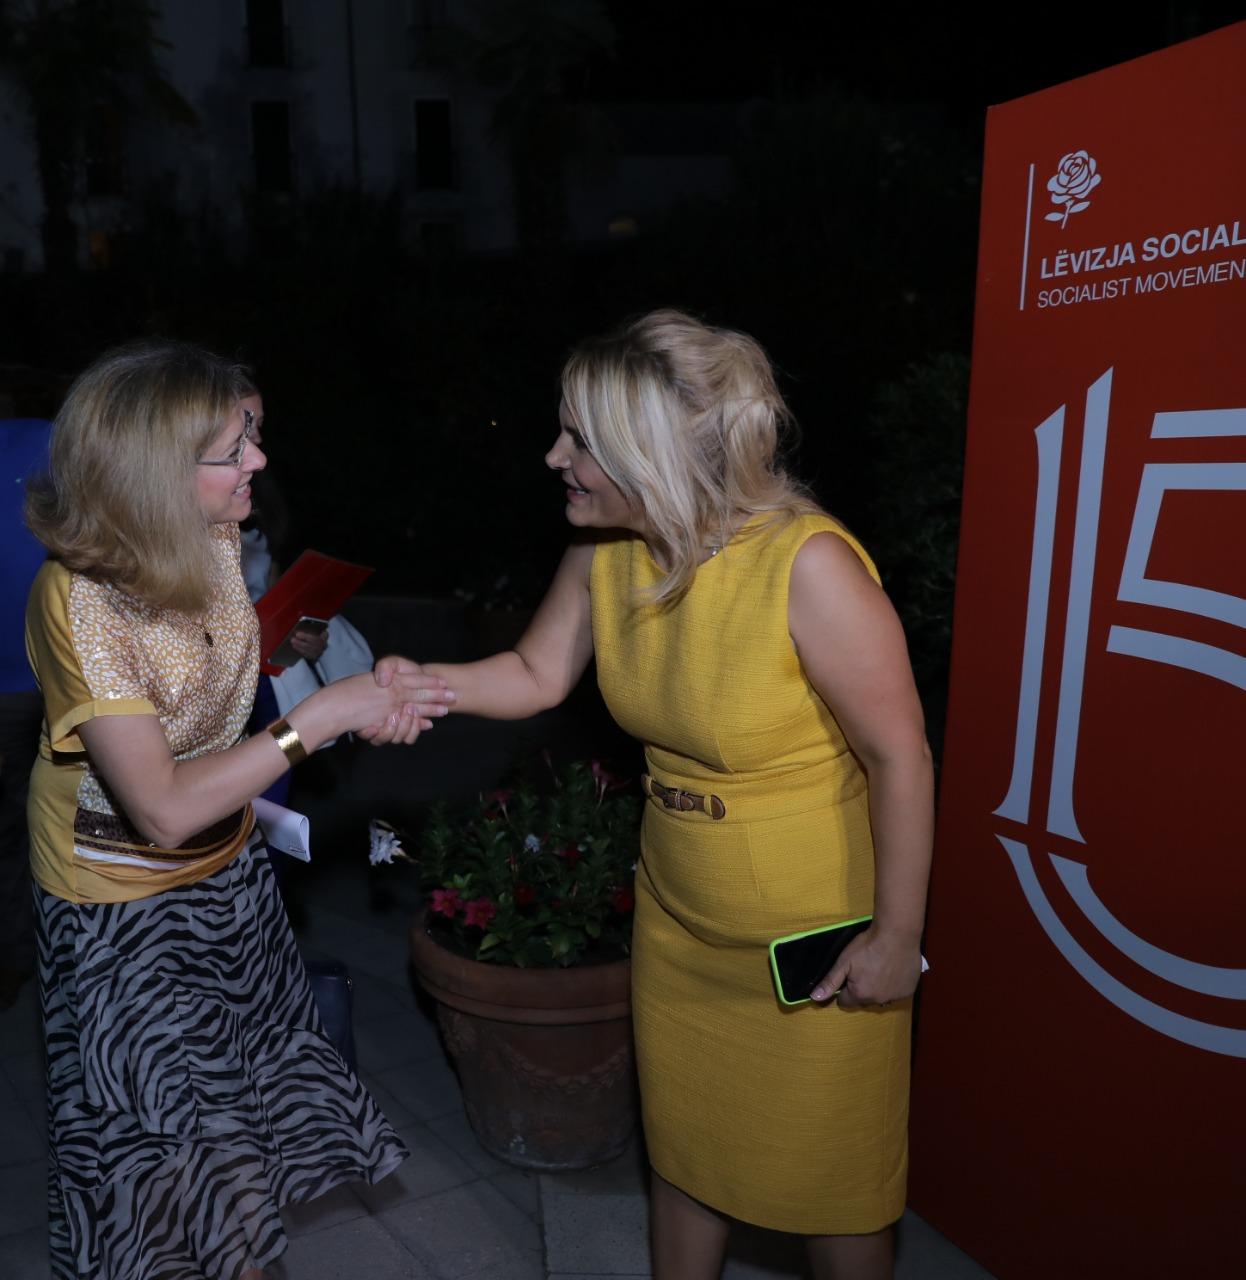 Festa e LSI 15vjetori kryemadhi pritja rogner-Ruci (3)